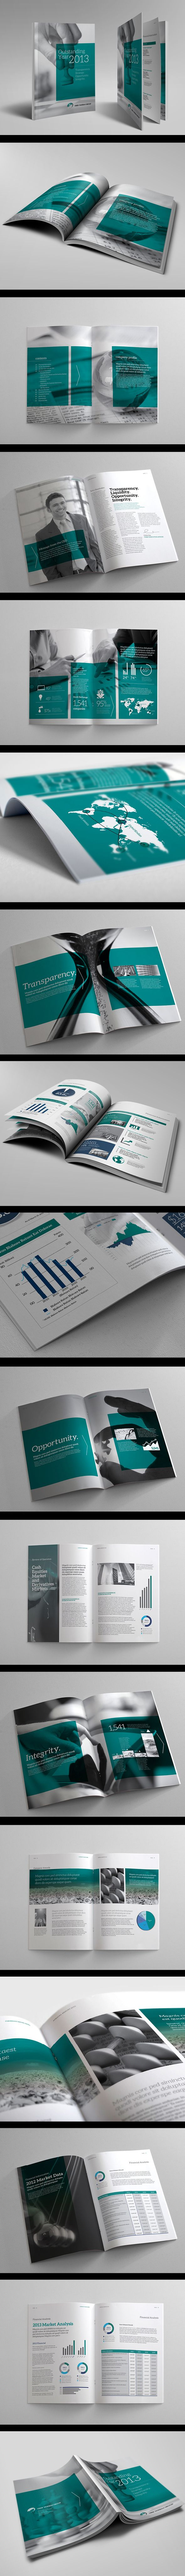 Corporate Annual Report Vol.4